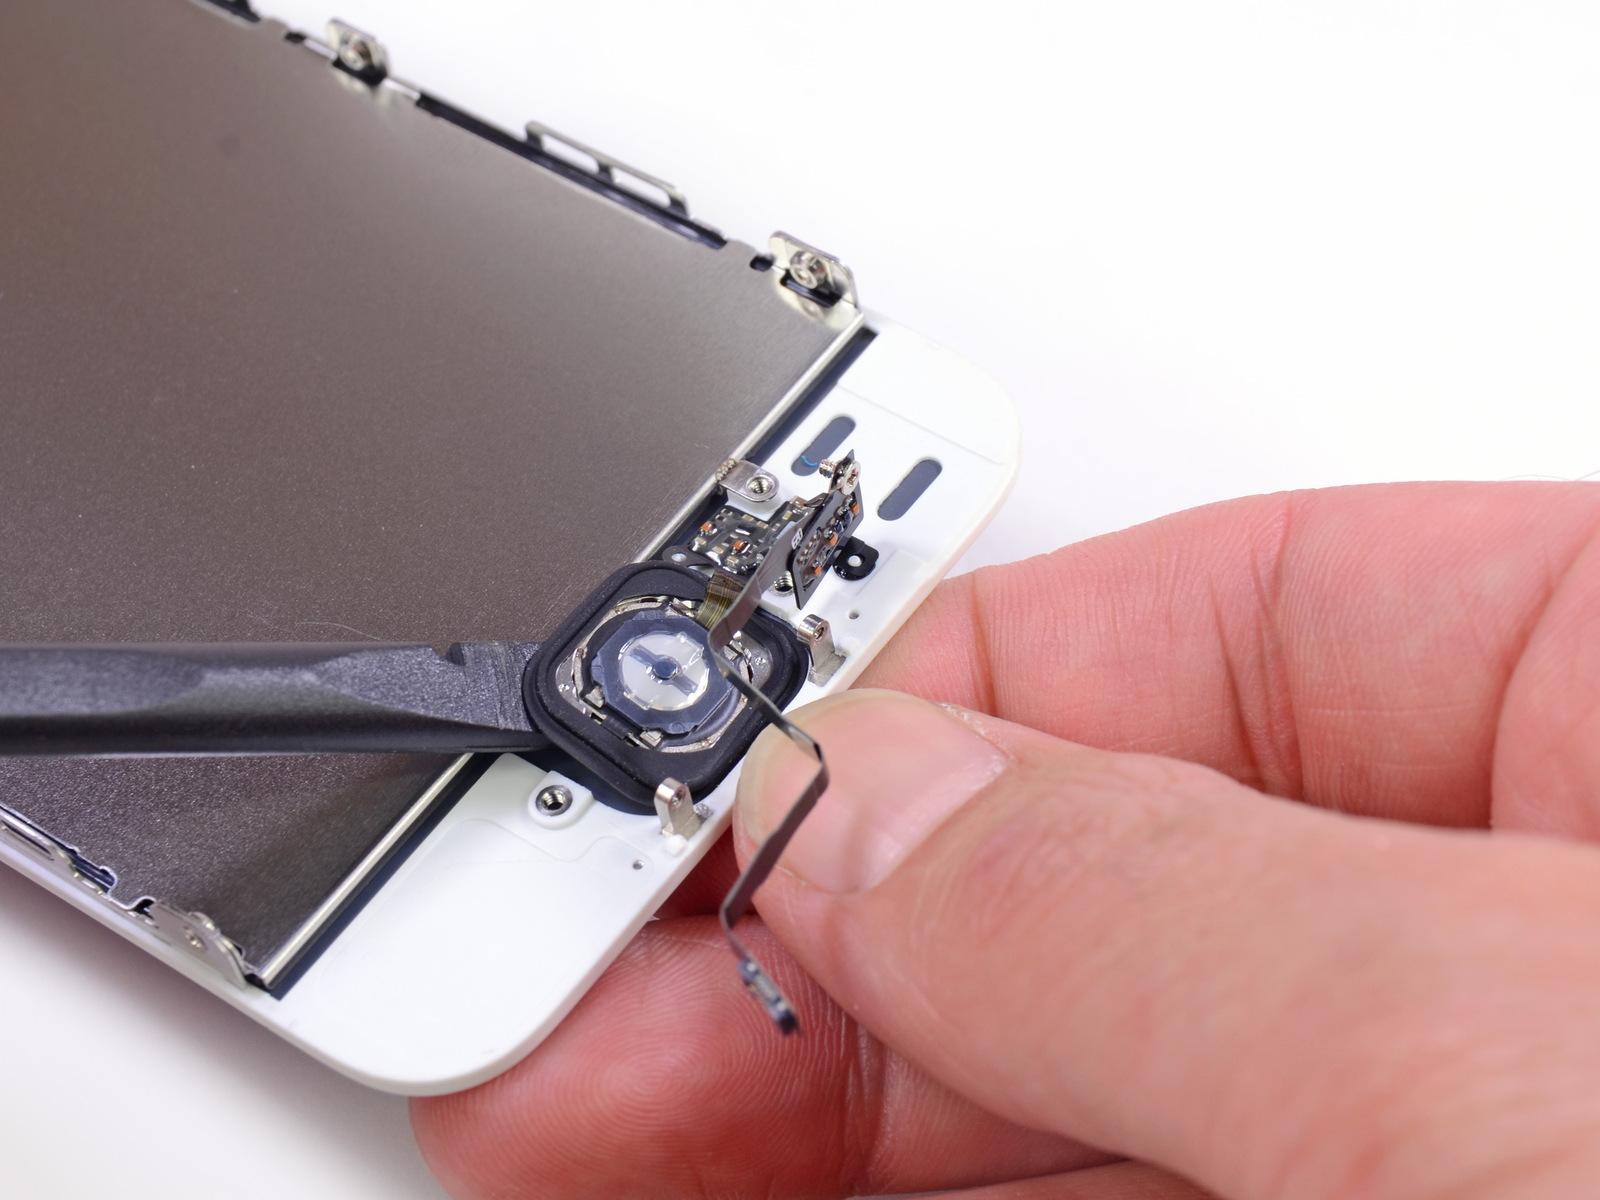 Desmontagem do iPhone 5s dourado - iFixit